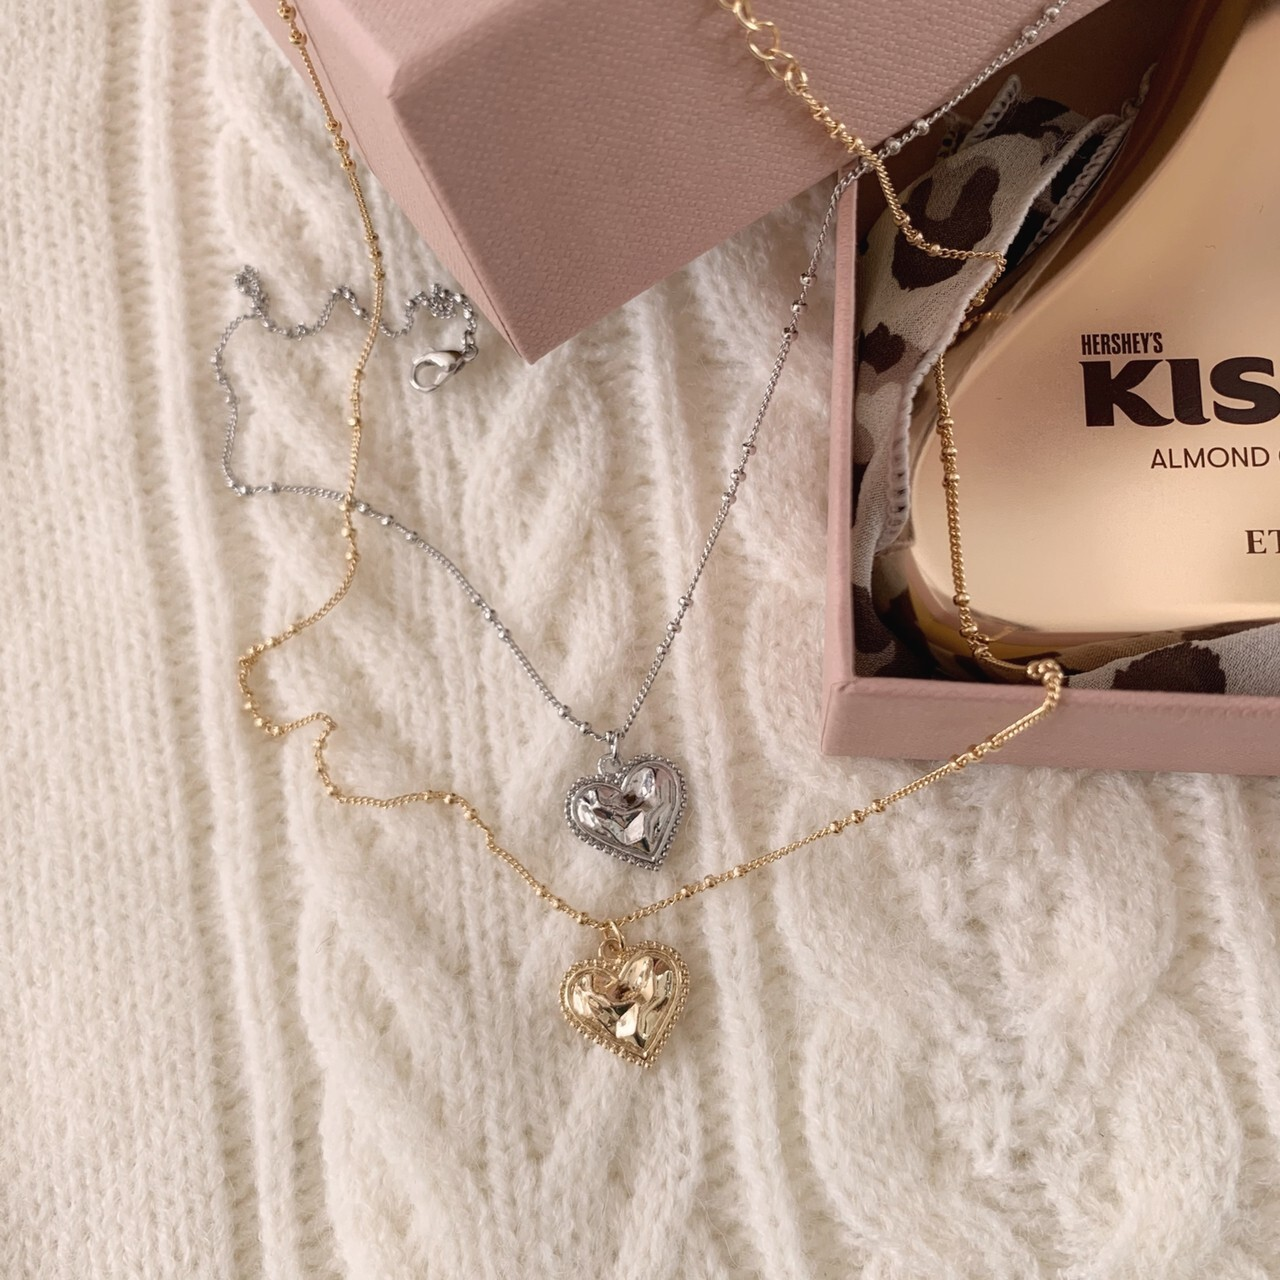 再販【meltie】petit heart necklace